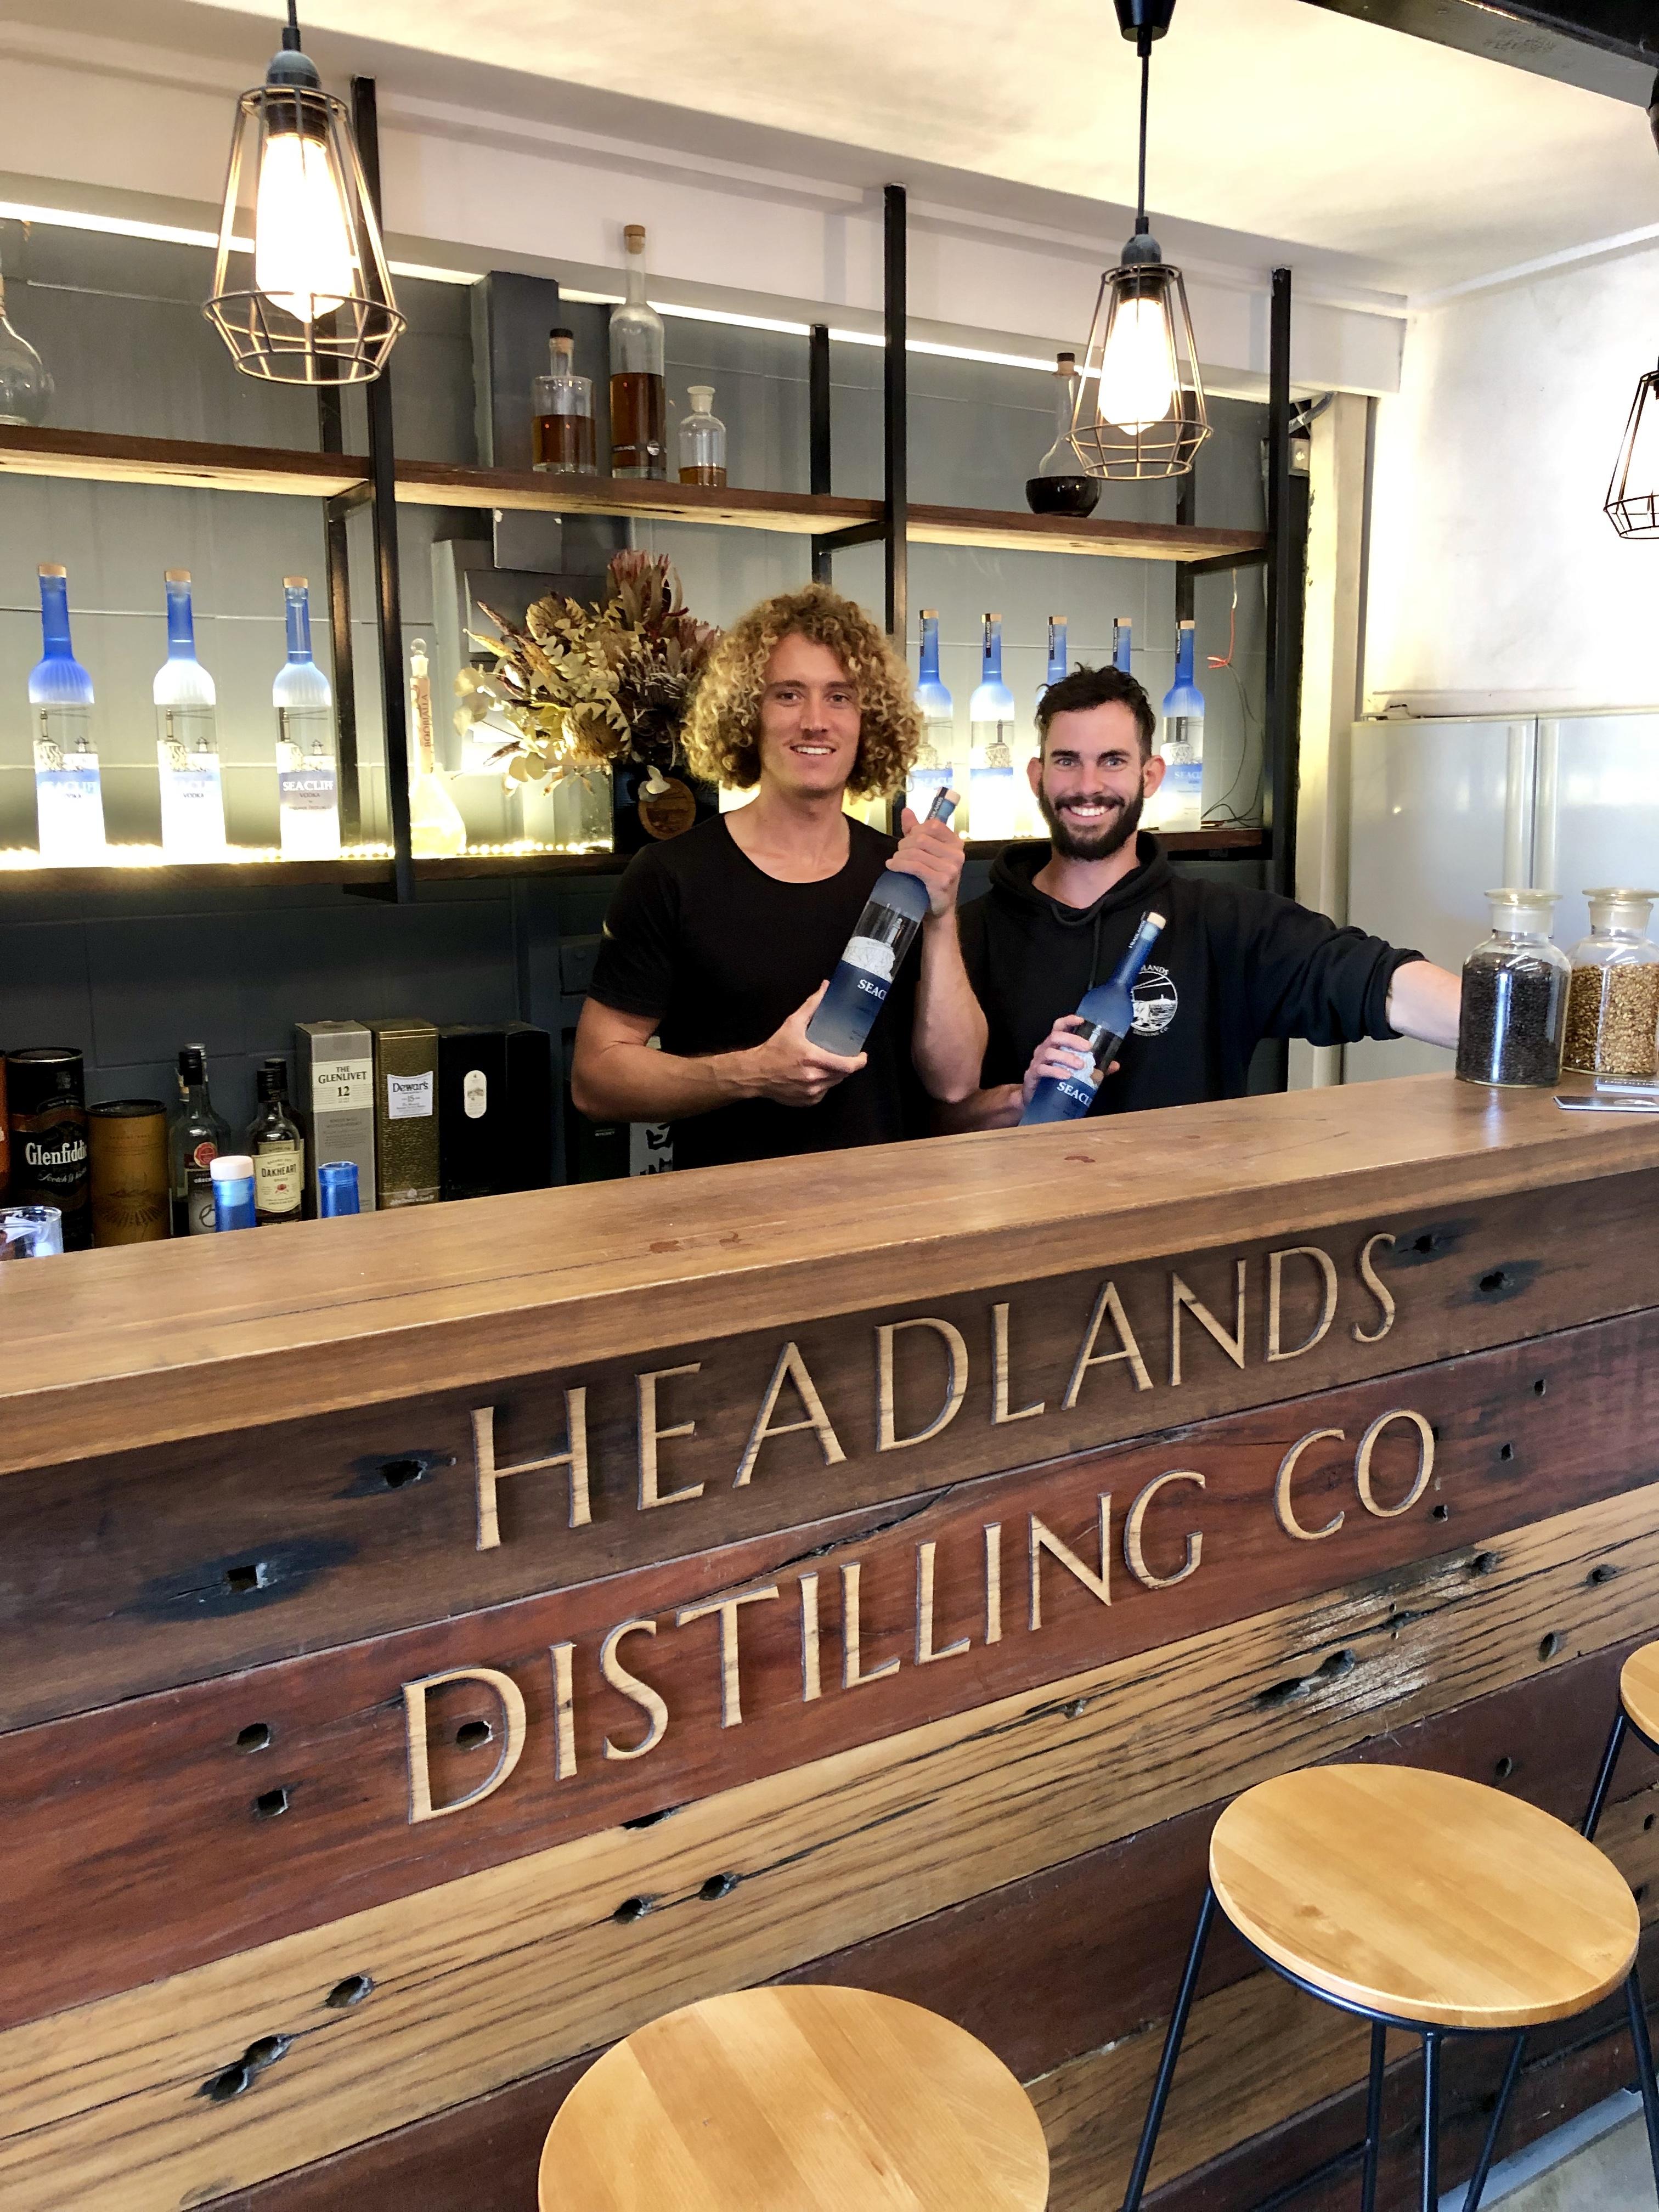 Headlands Distilling Co ,Wollongong